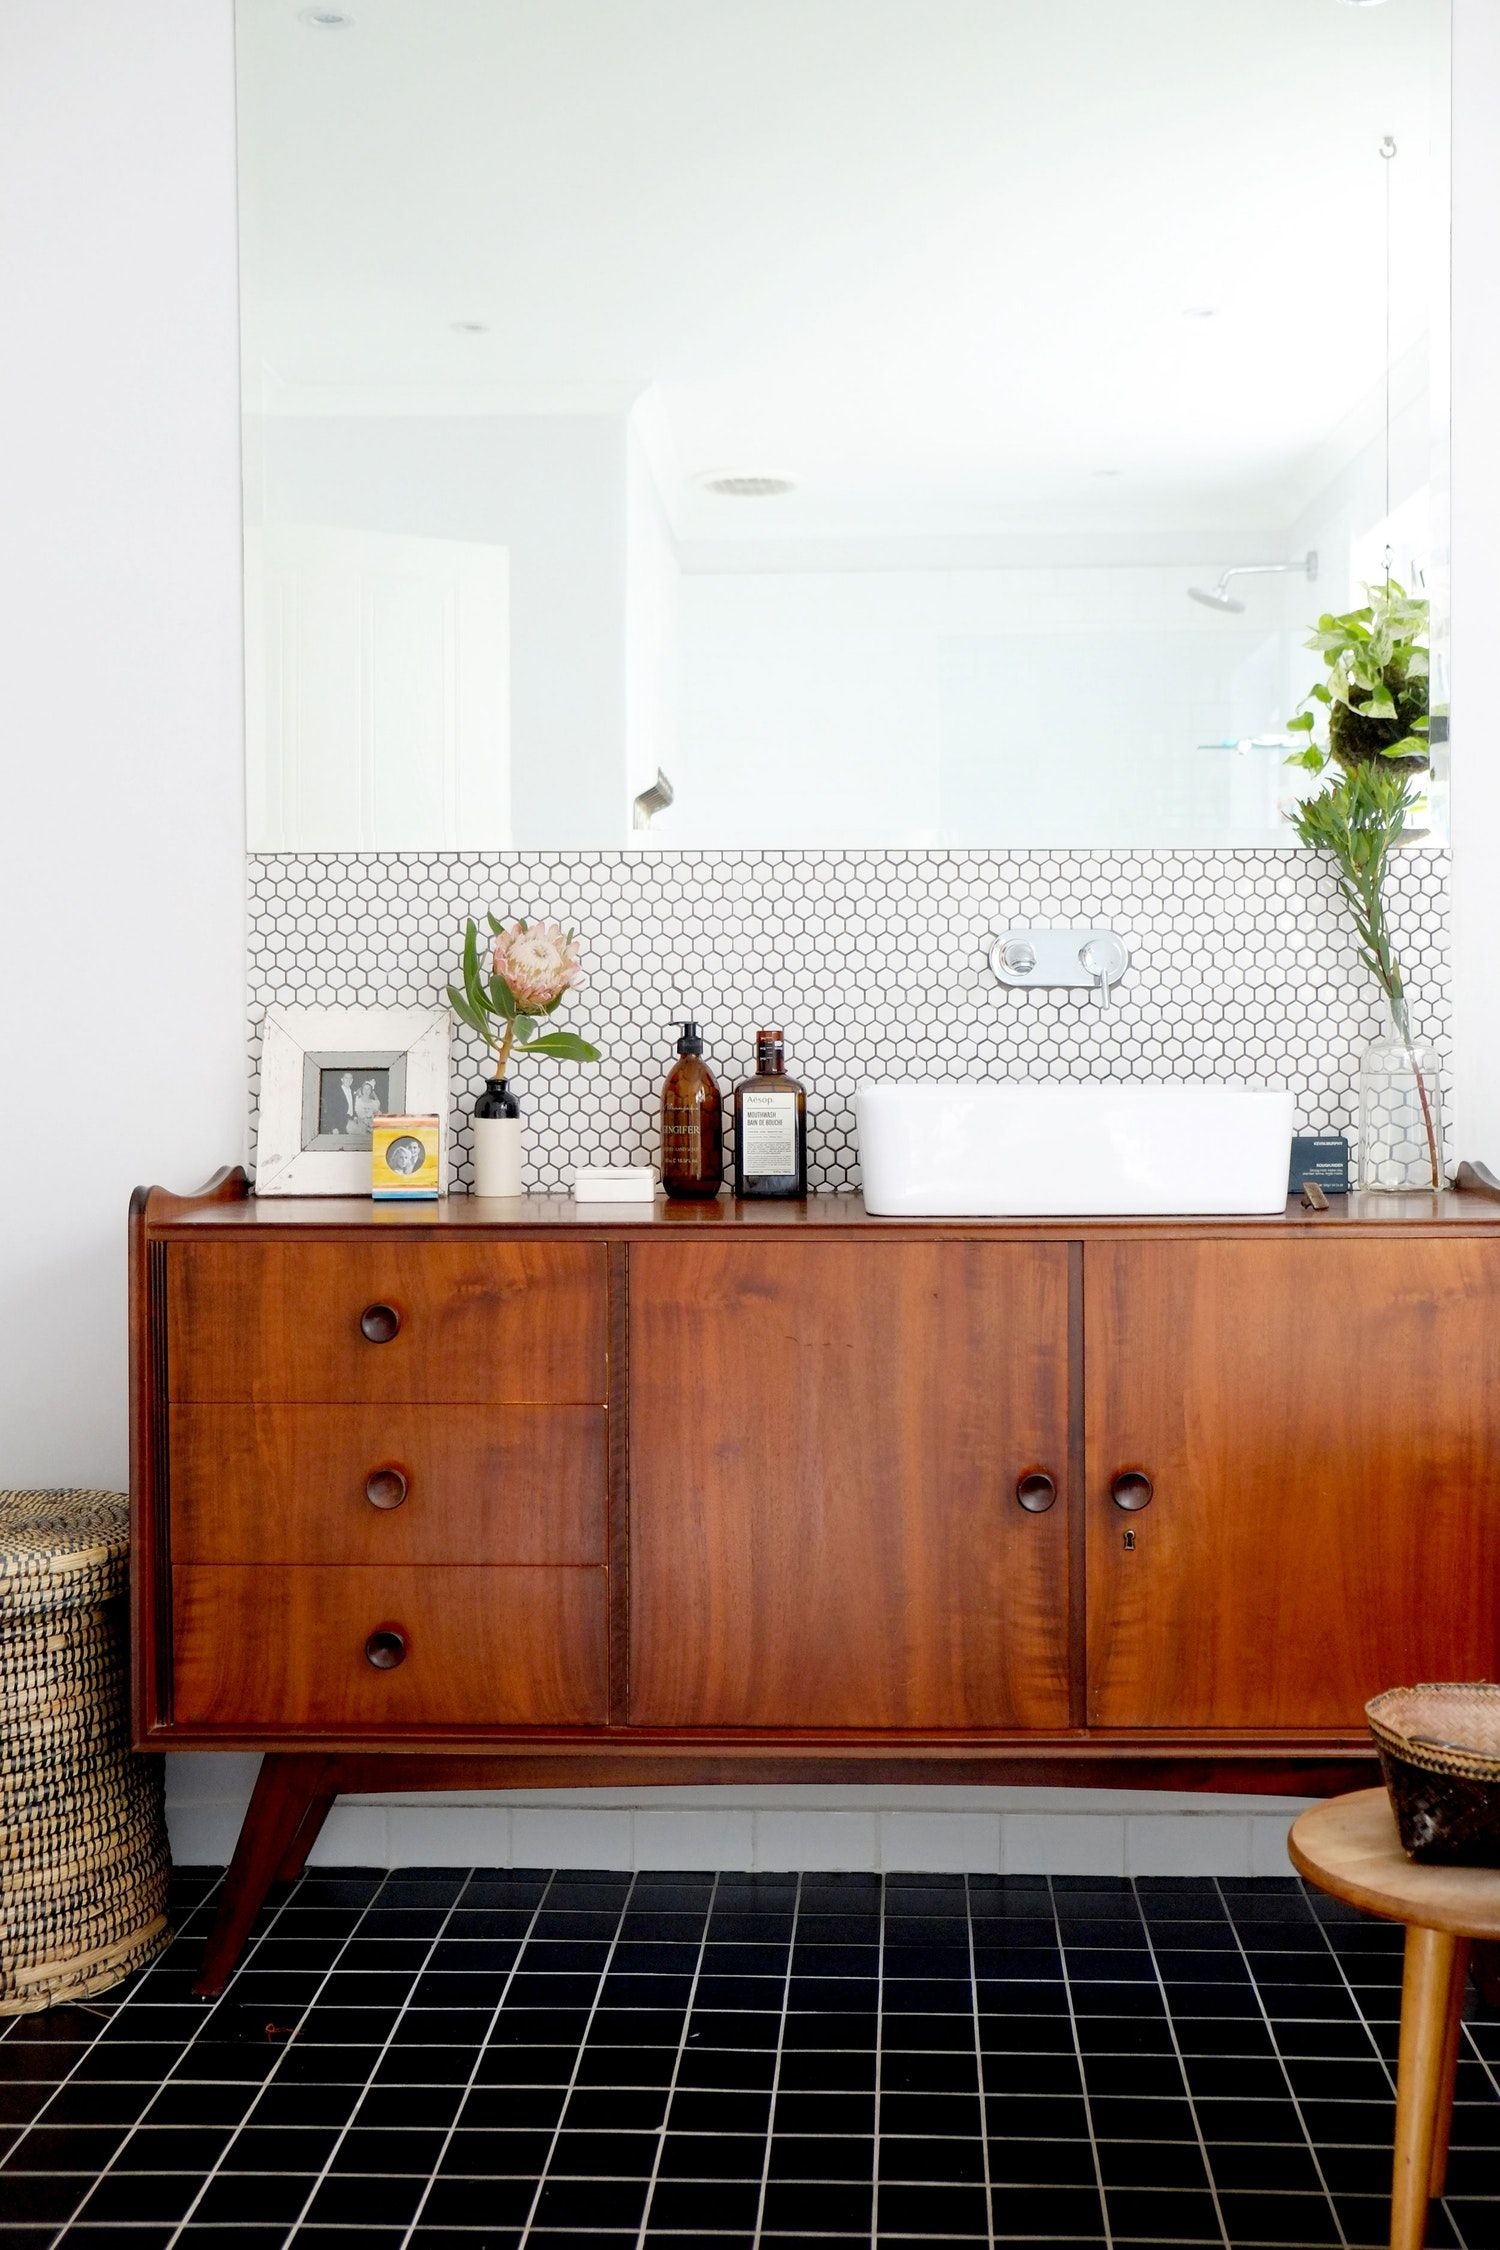 Tackle This  Minute Bathroom Clean Out Decorating A Bathroombathroom Remodelingbathroom Ideasbathroom